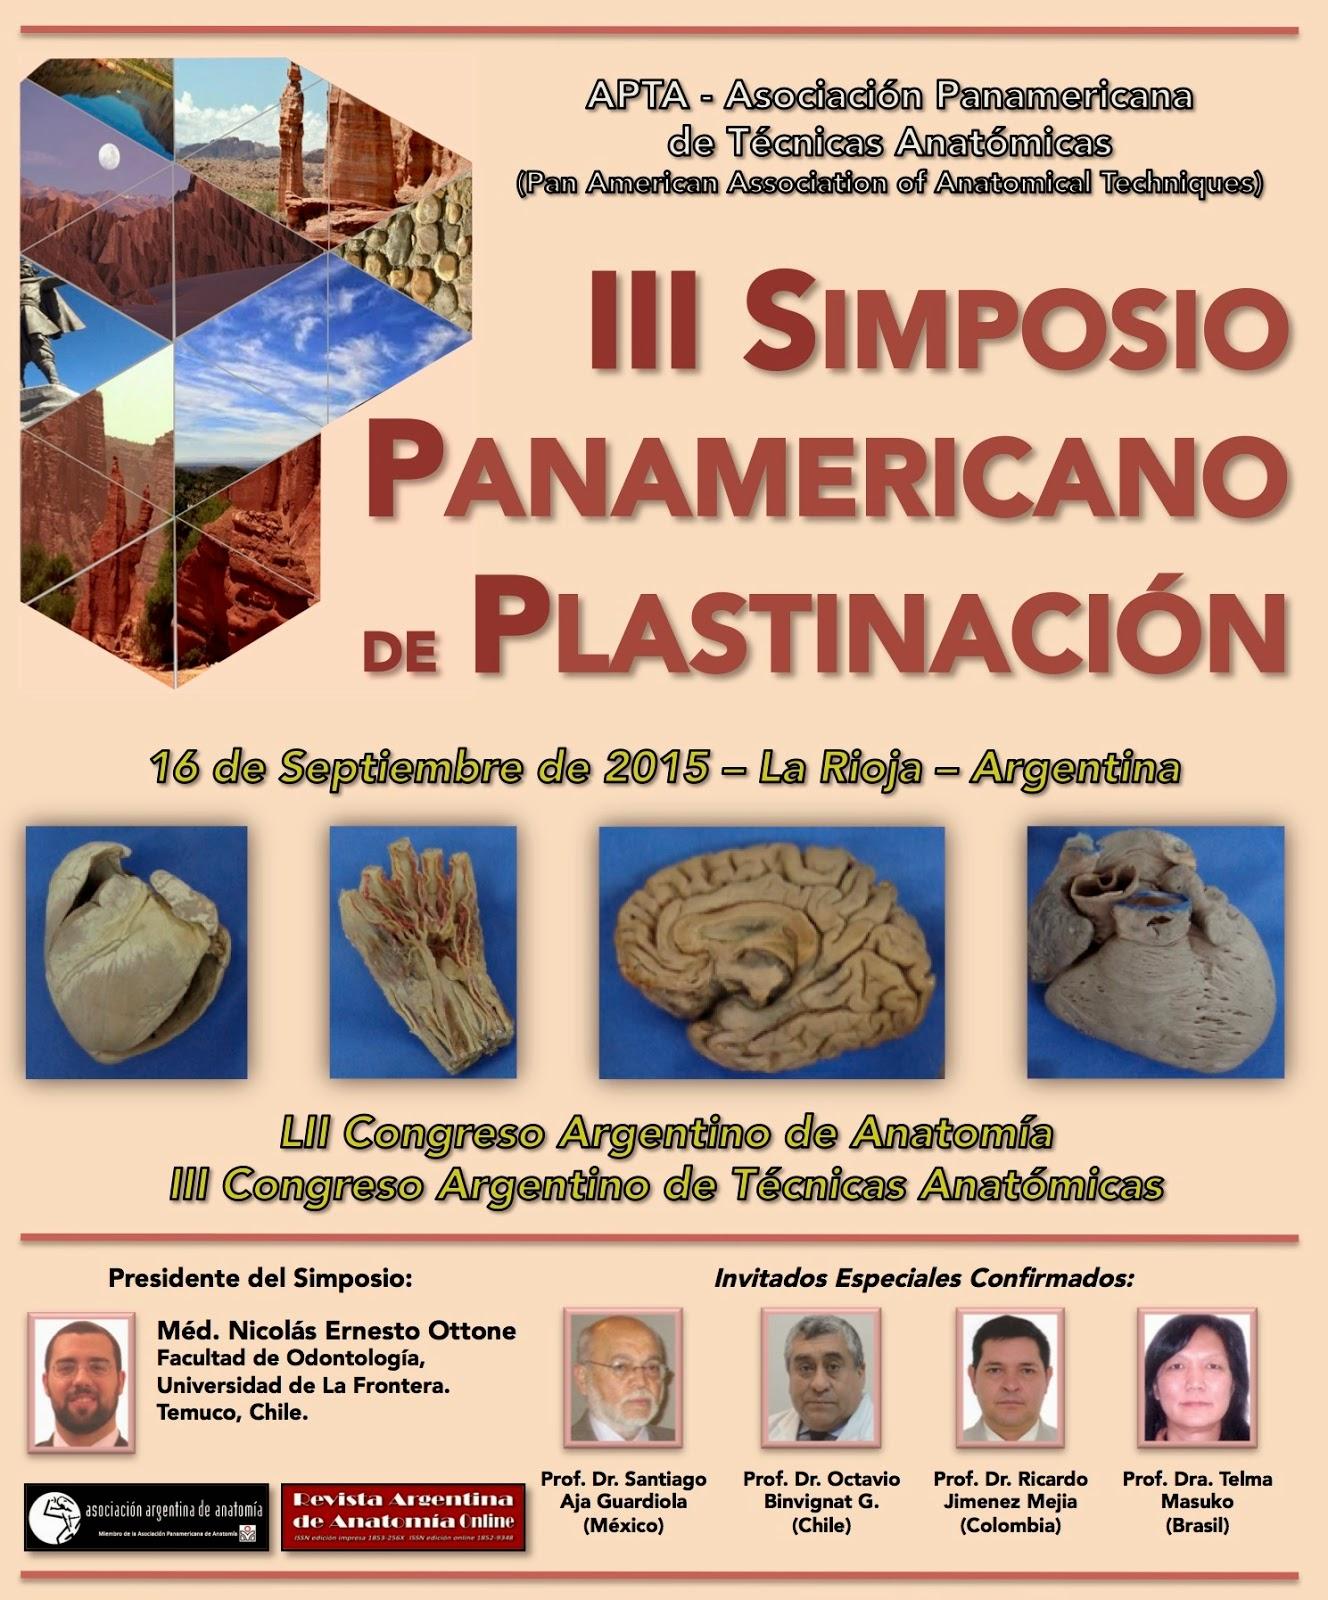 http://www.congresodeanatomia.com.ar/p/ii-simposio-panamericano-de-plastinacion.html